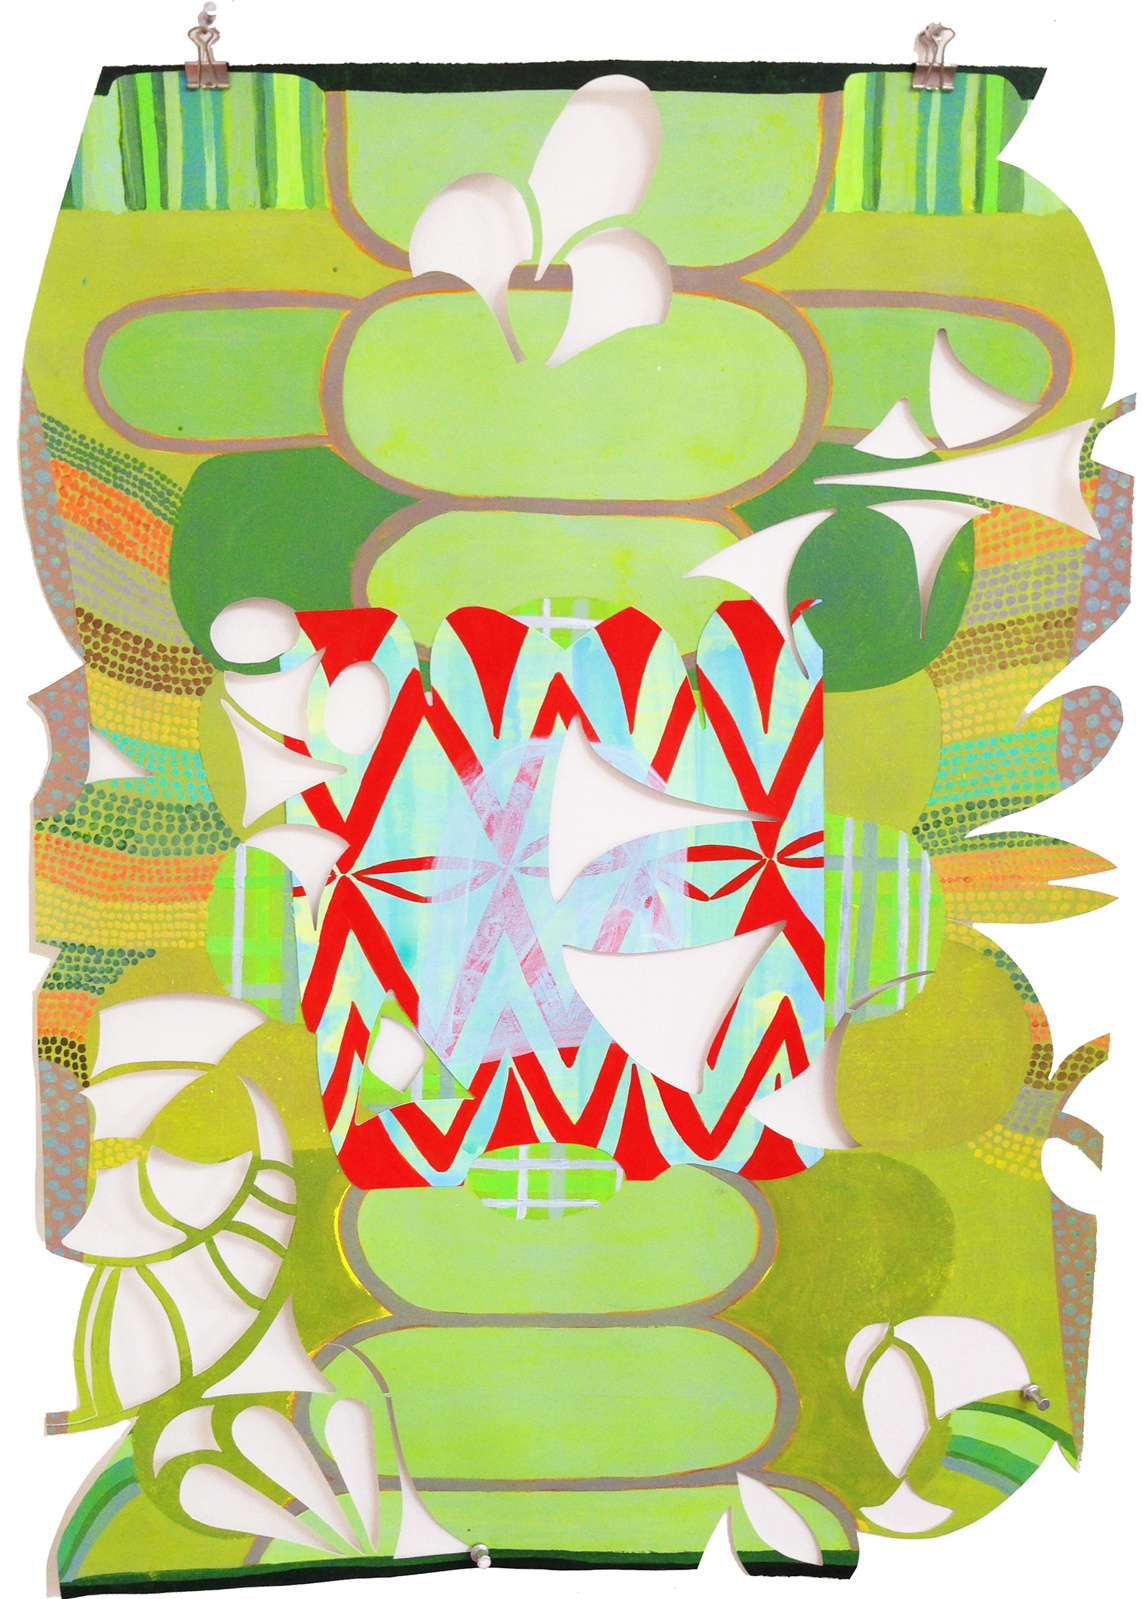 untitled (green cut paper)